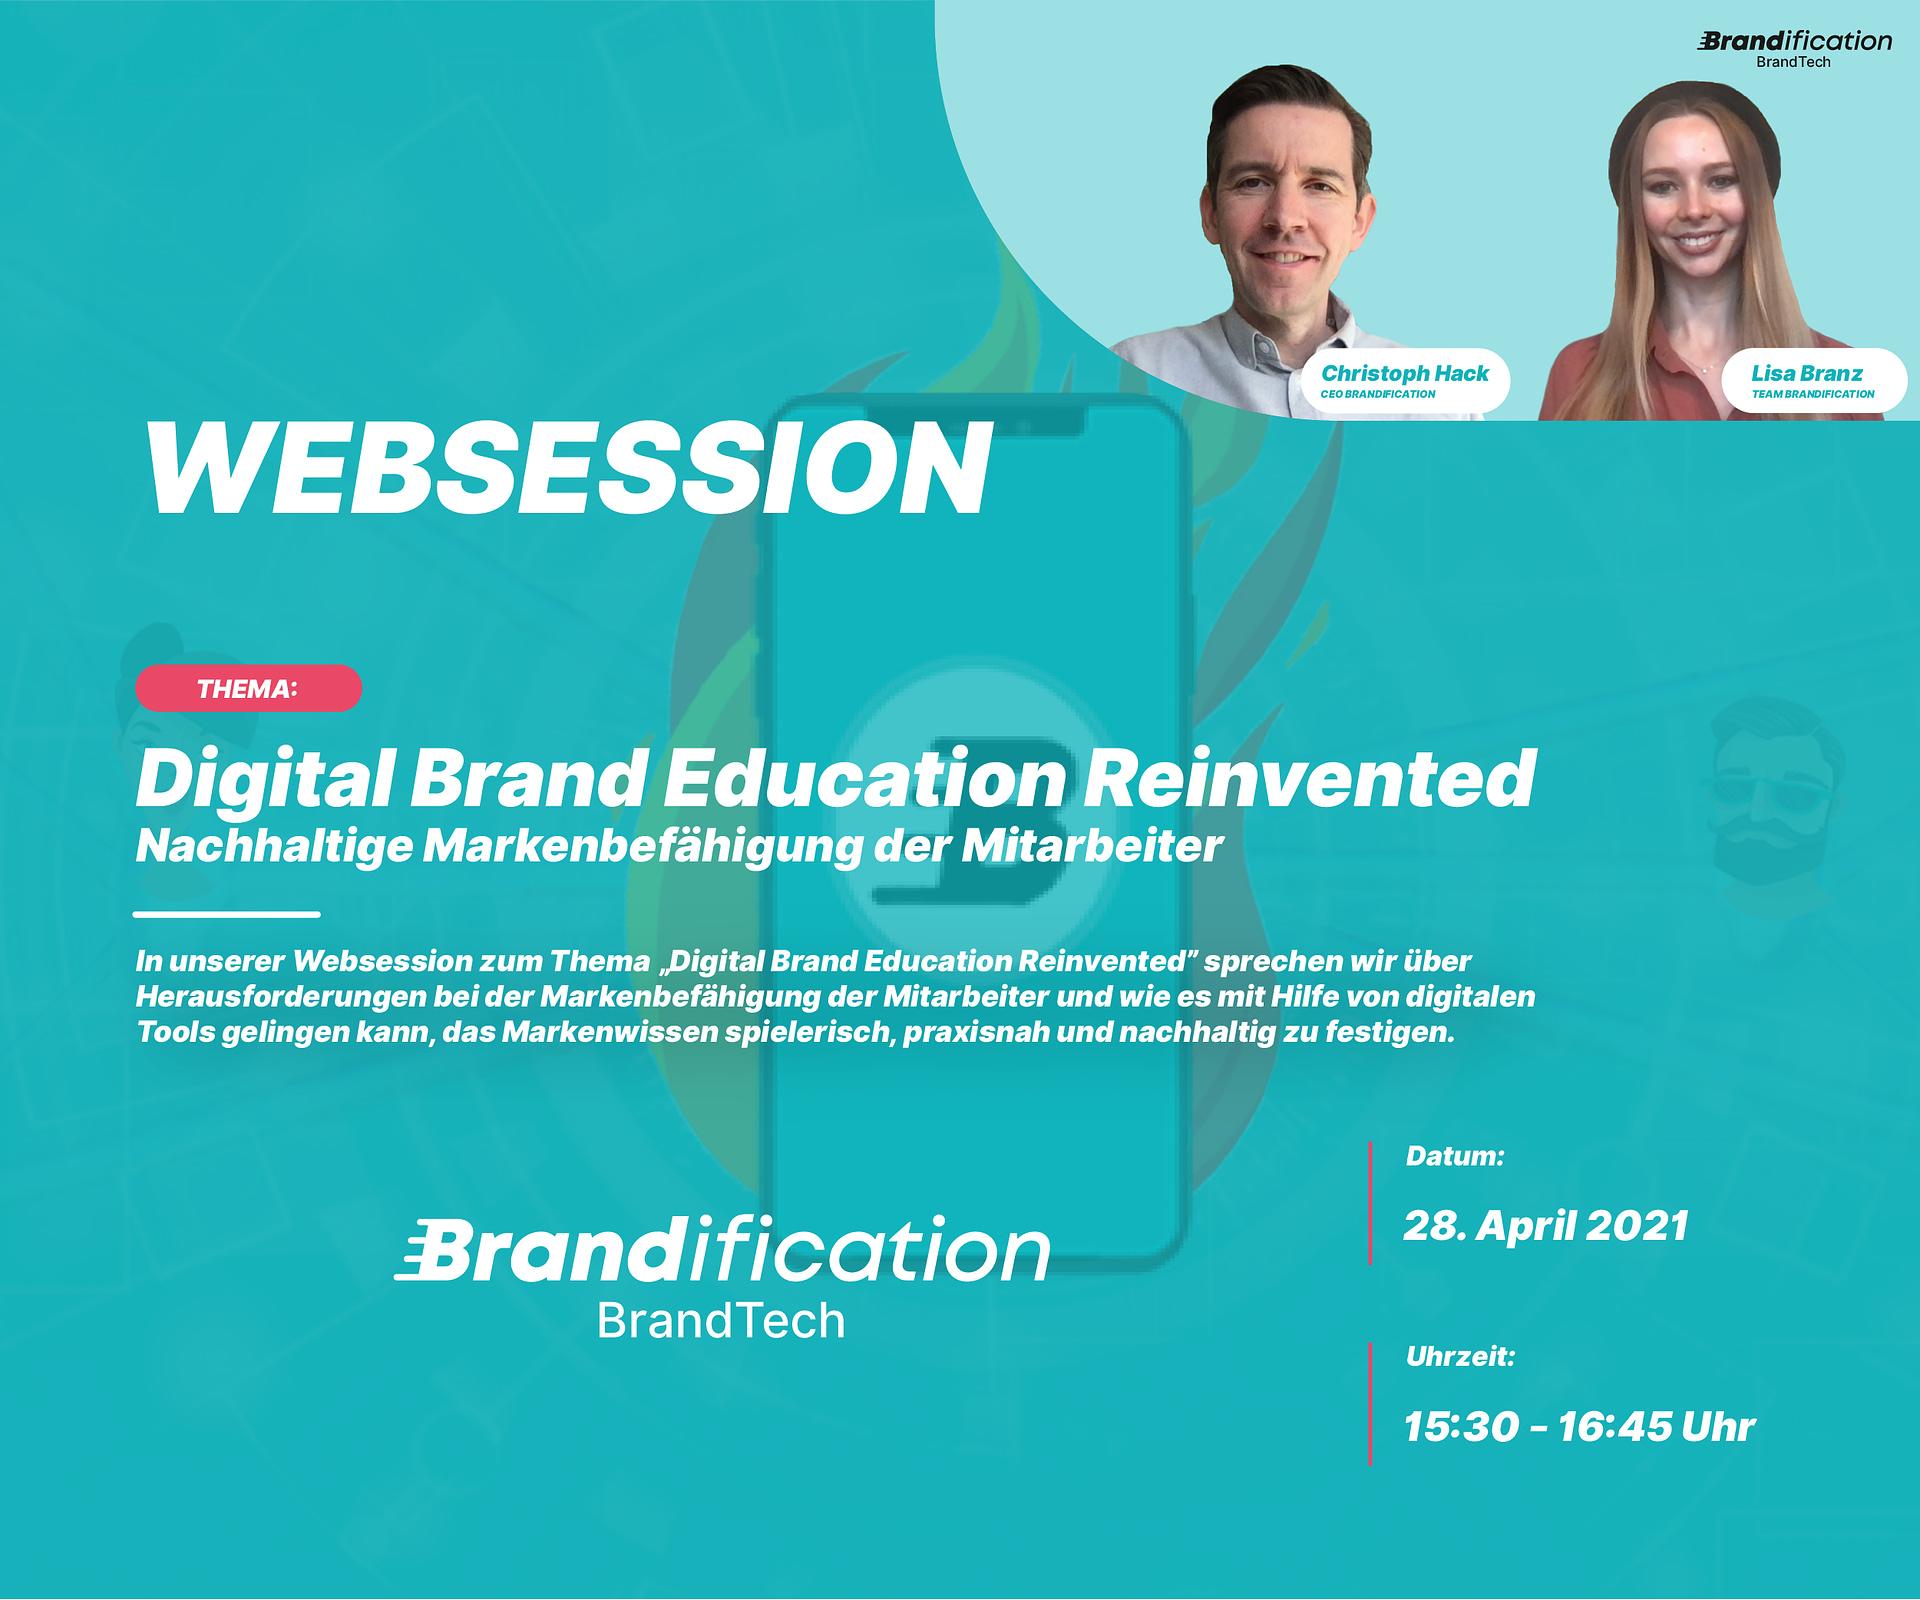 Web session: Digital Brand Education Reinvented